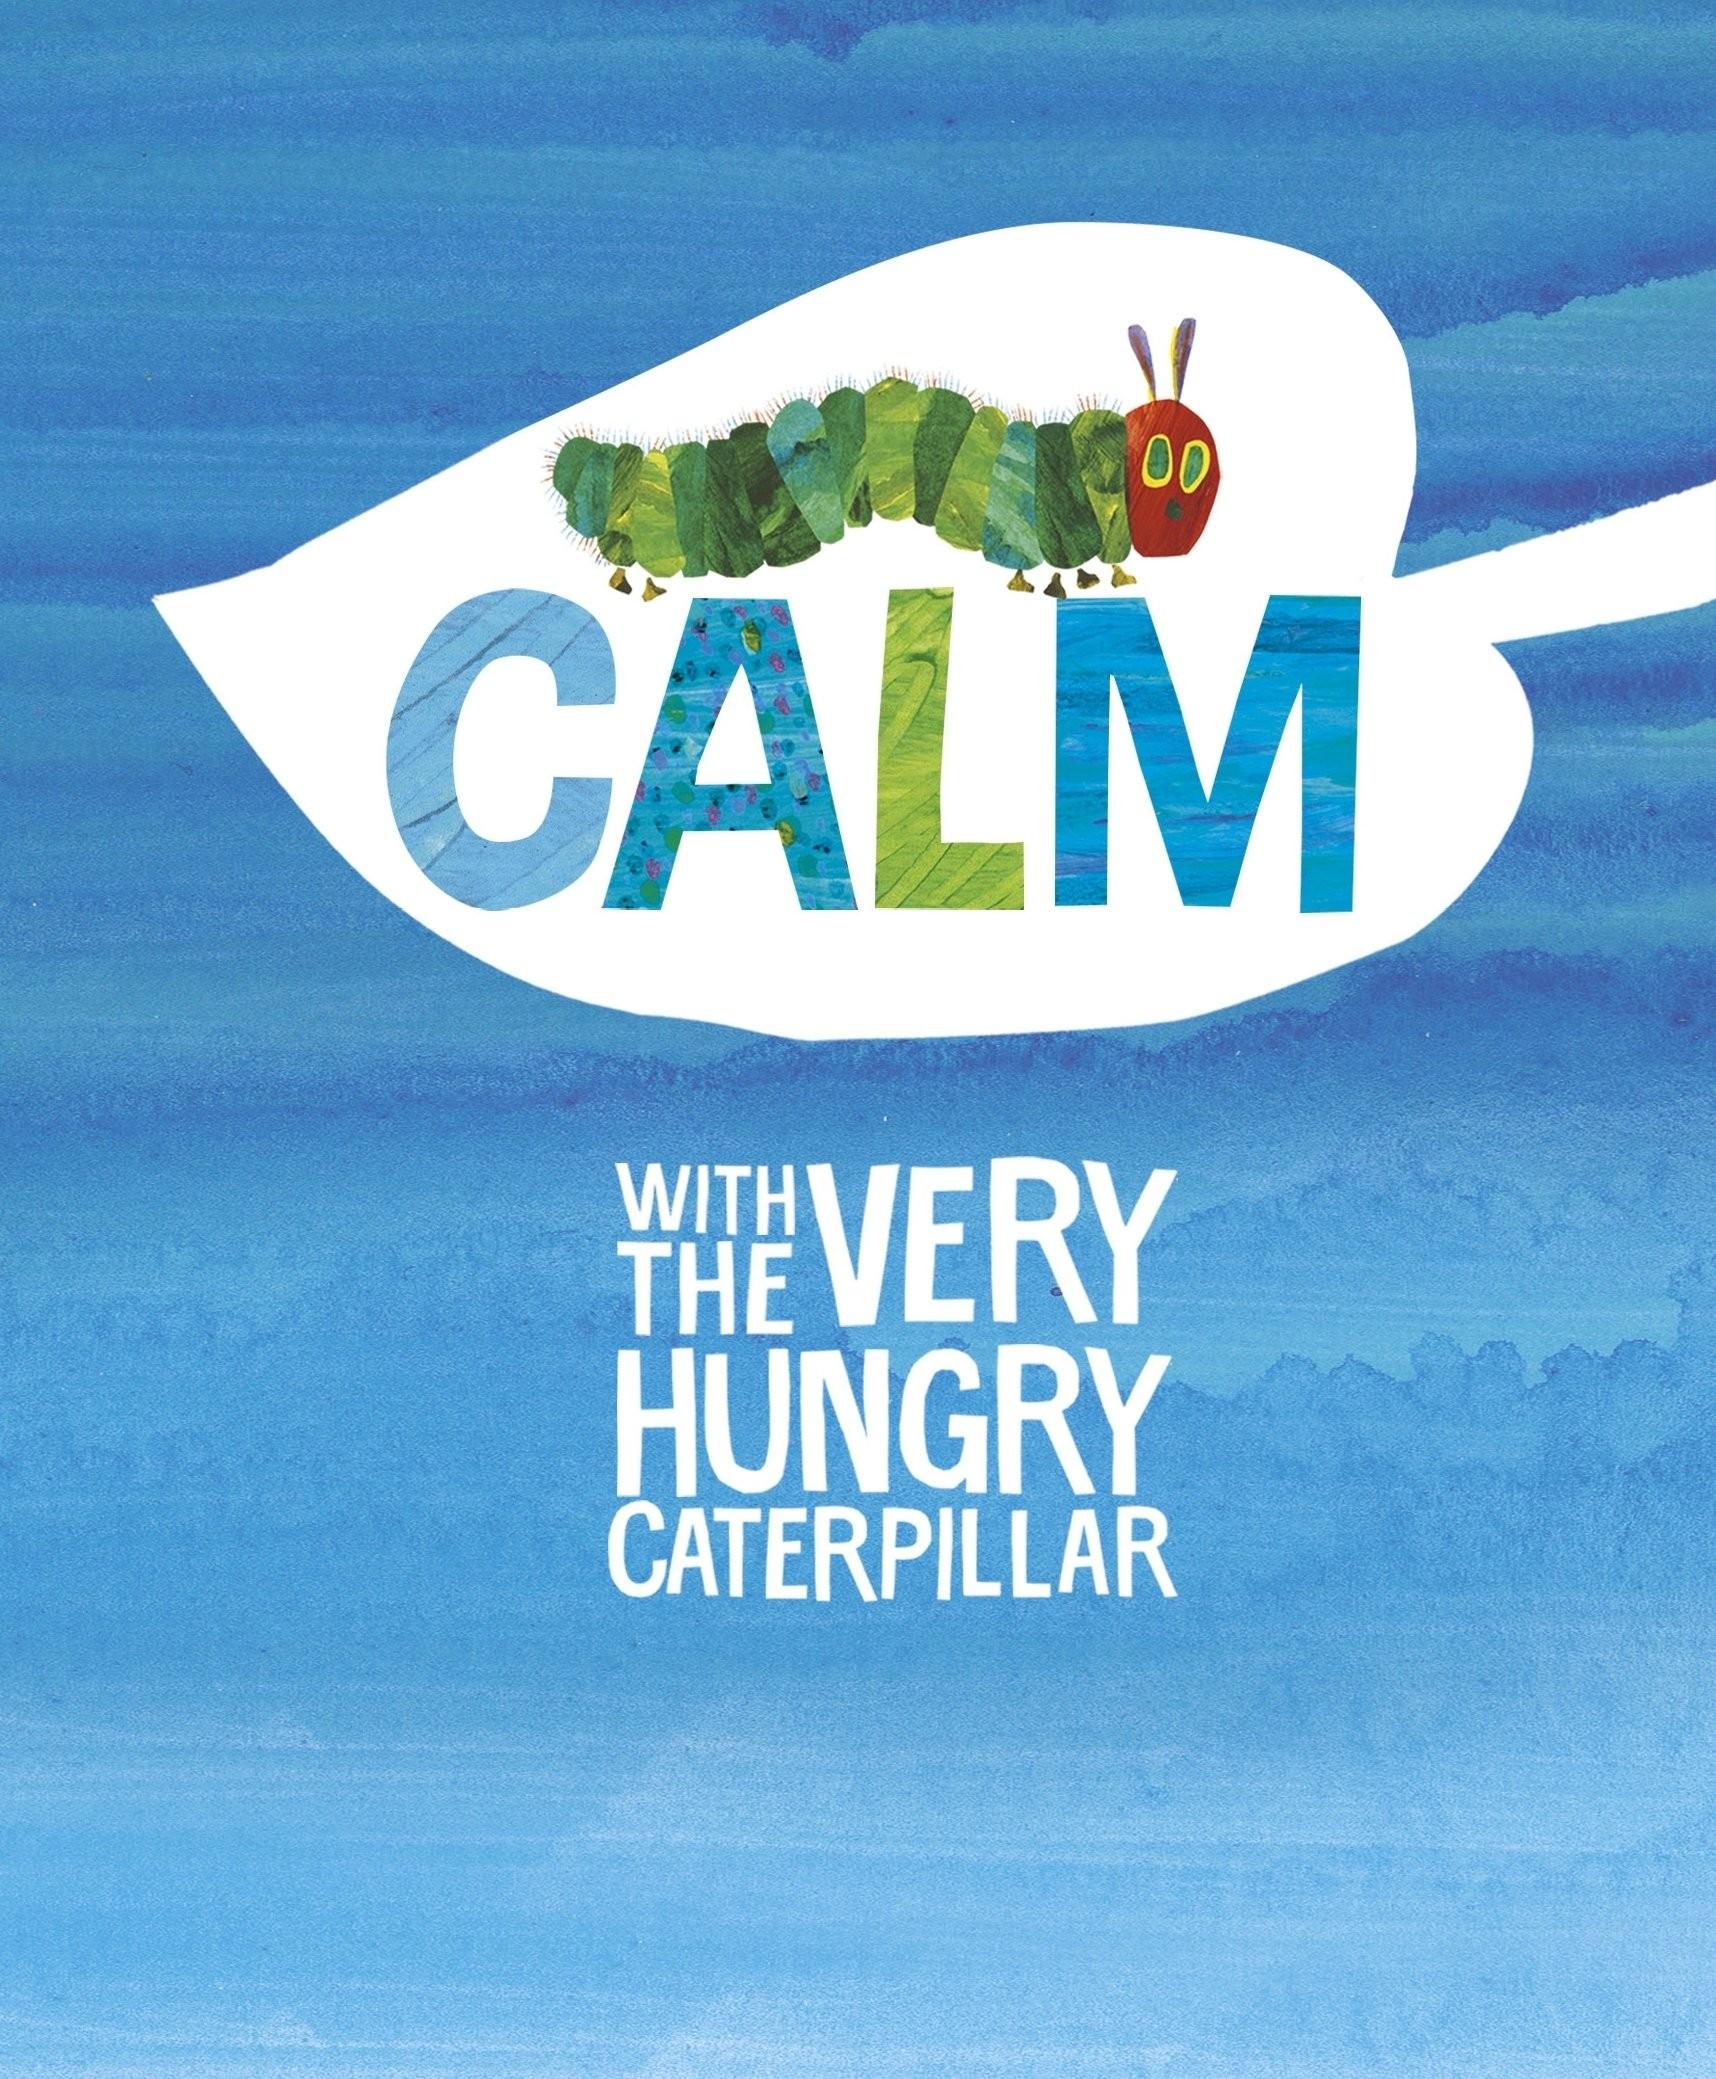 5-of-the-best-mindfulness-books-for-kids_calmtara